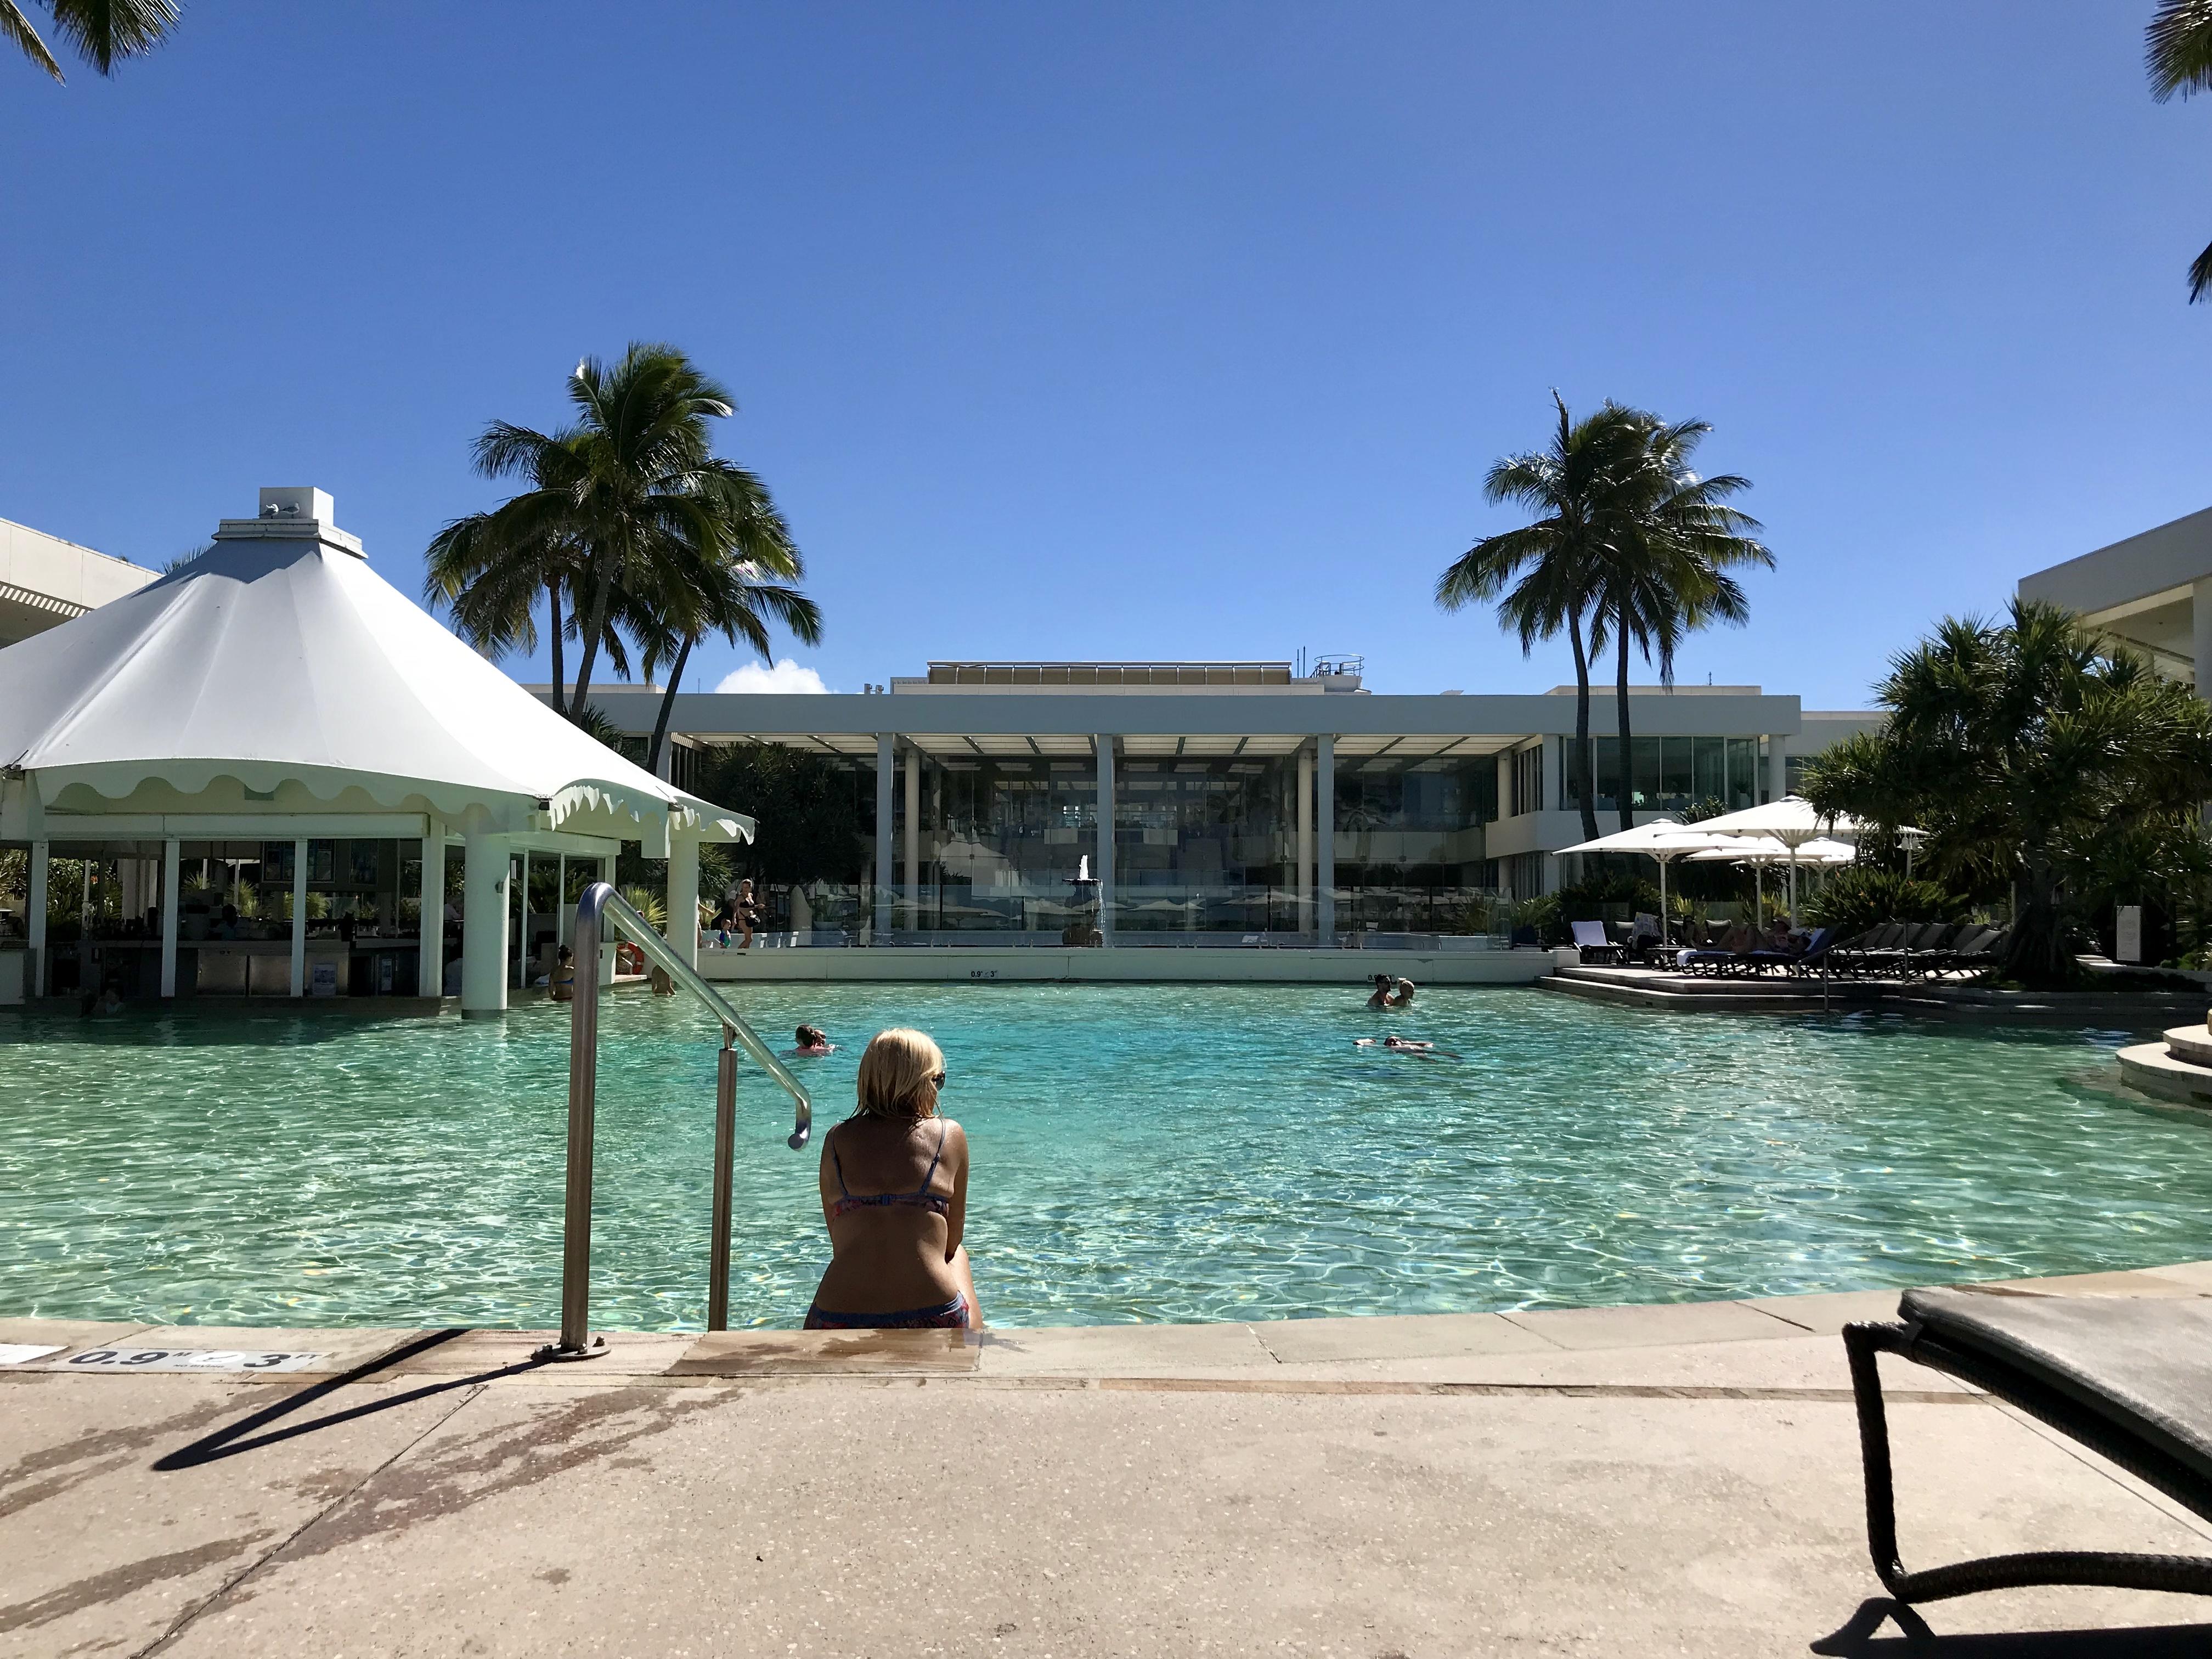 File:Swimming pool of Sheraton Grand Mirage Resort, Gold